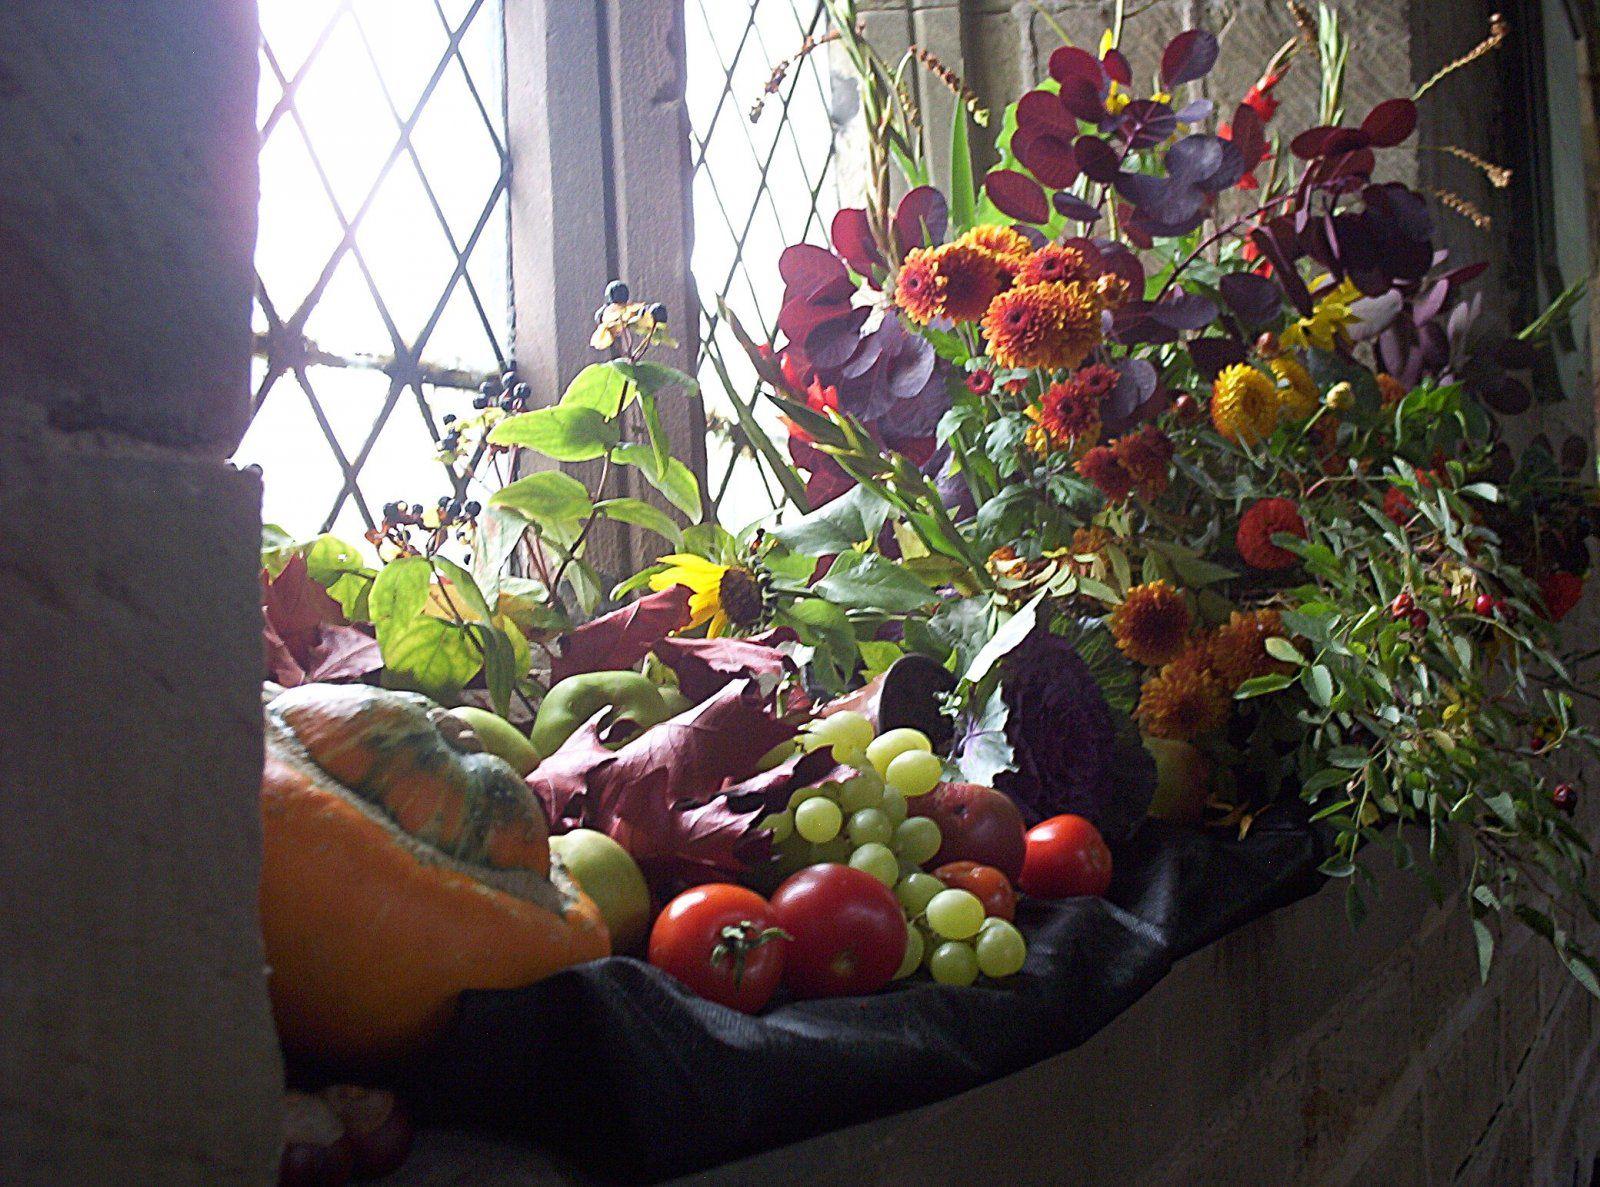 Harvest Festival A Lovely Arrangement In A Church Window Harvest Festival Harvest Festival Decorations Harvest Decorations